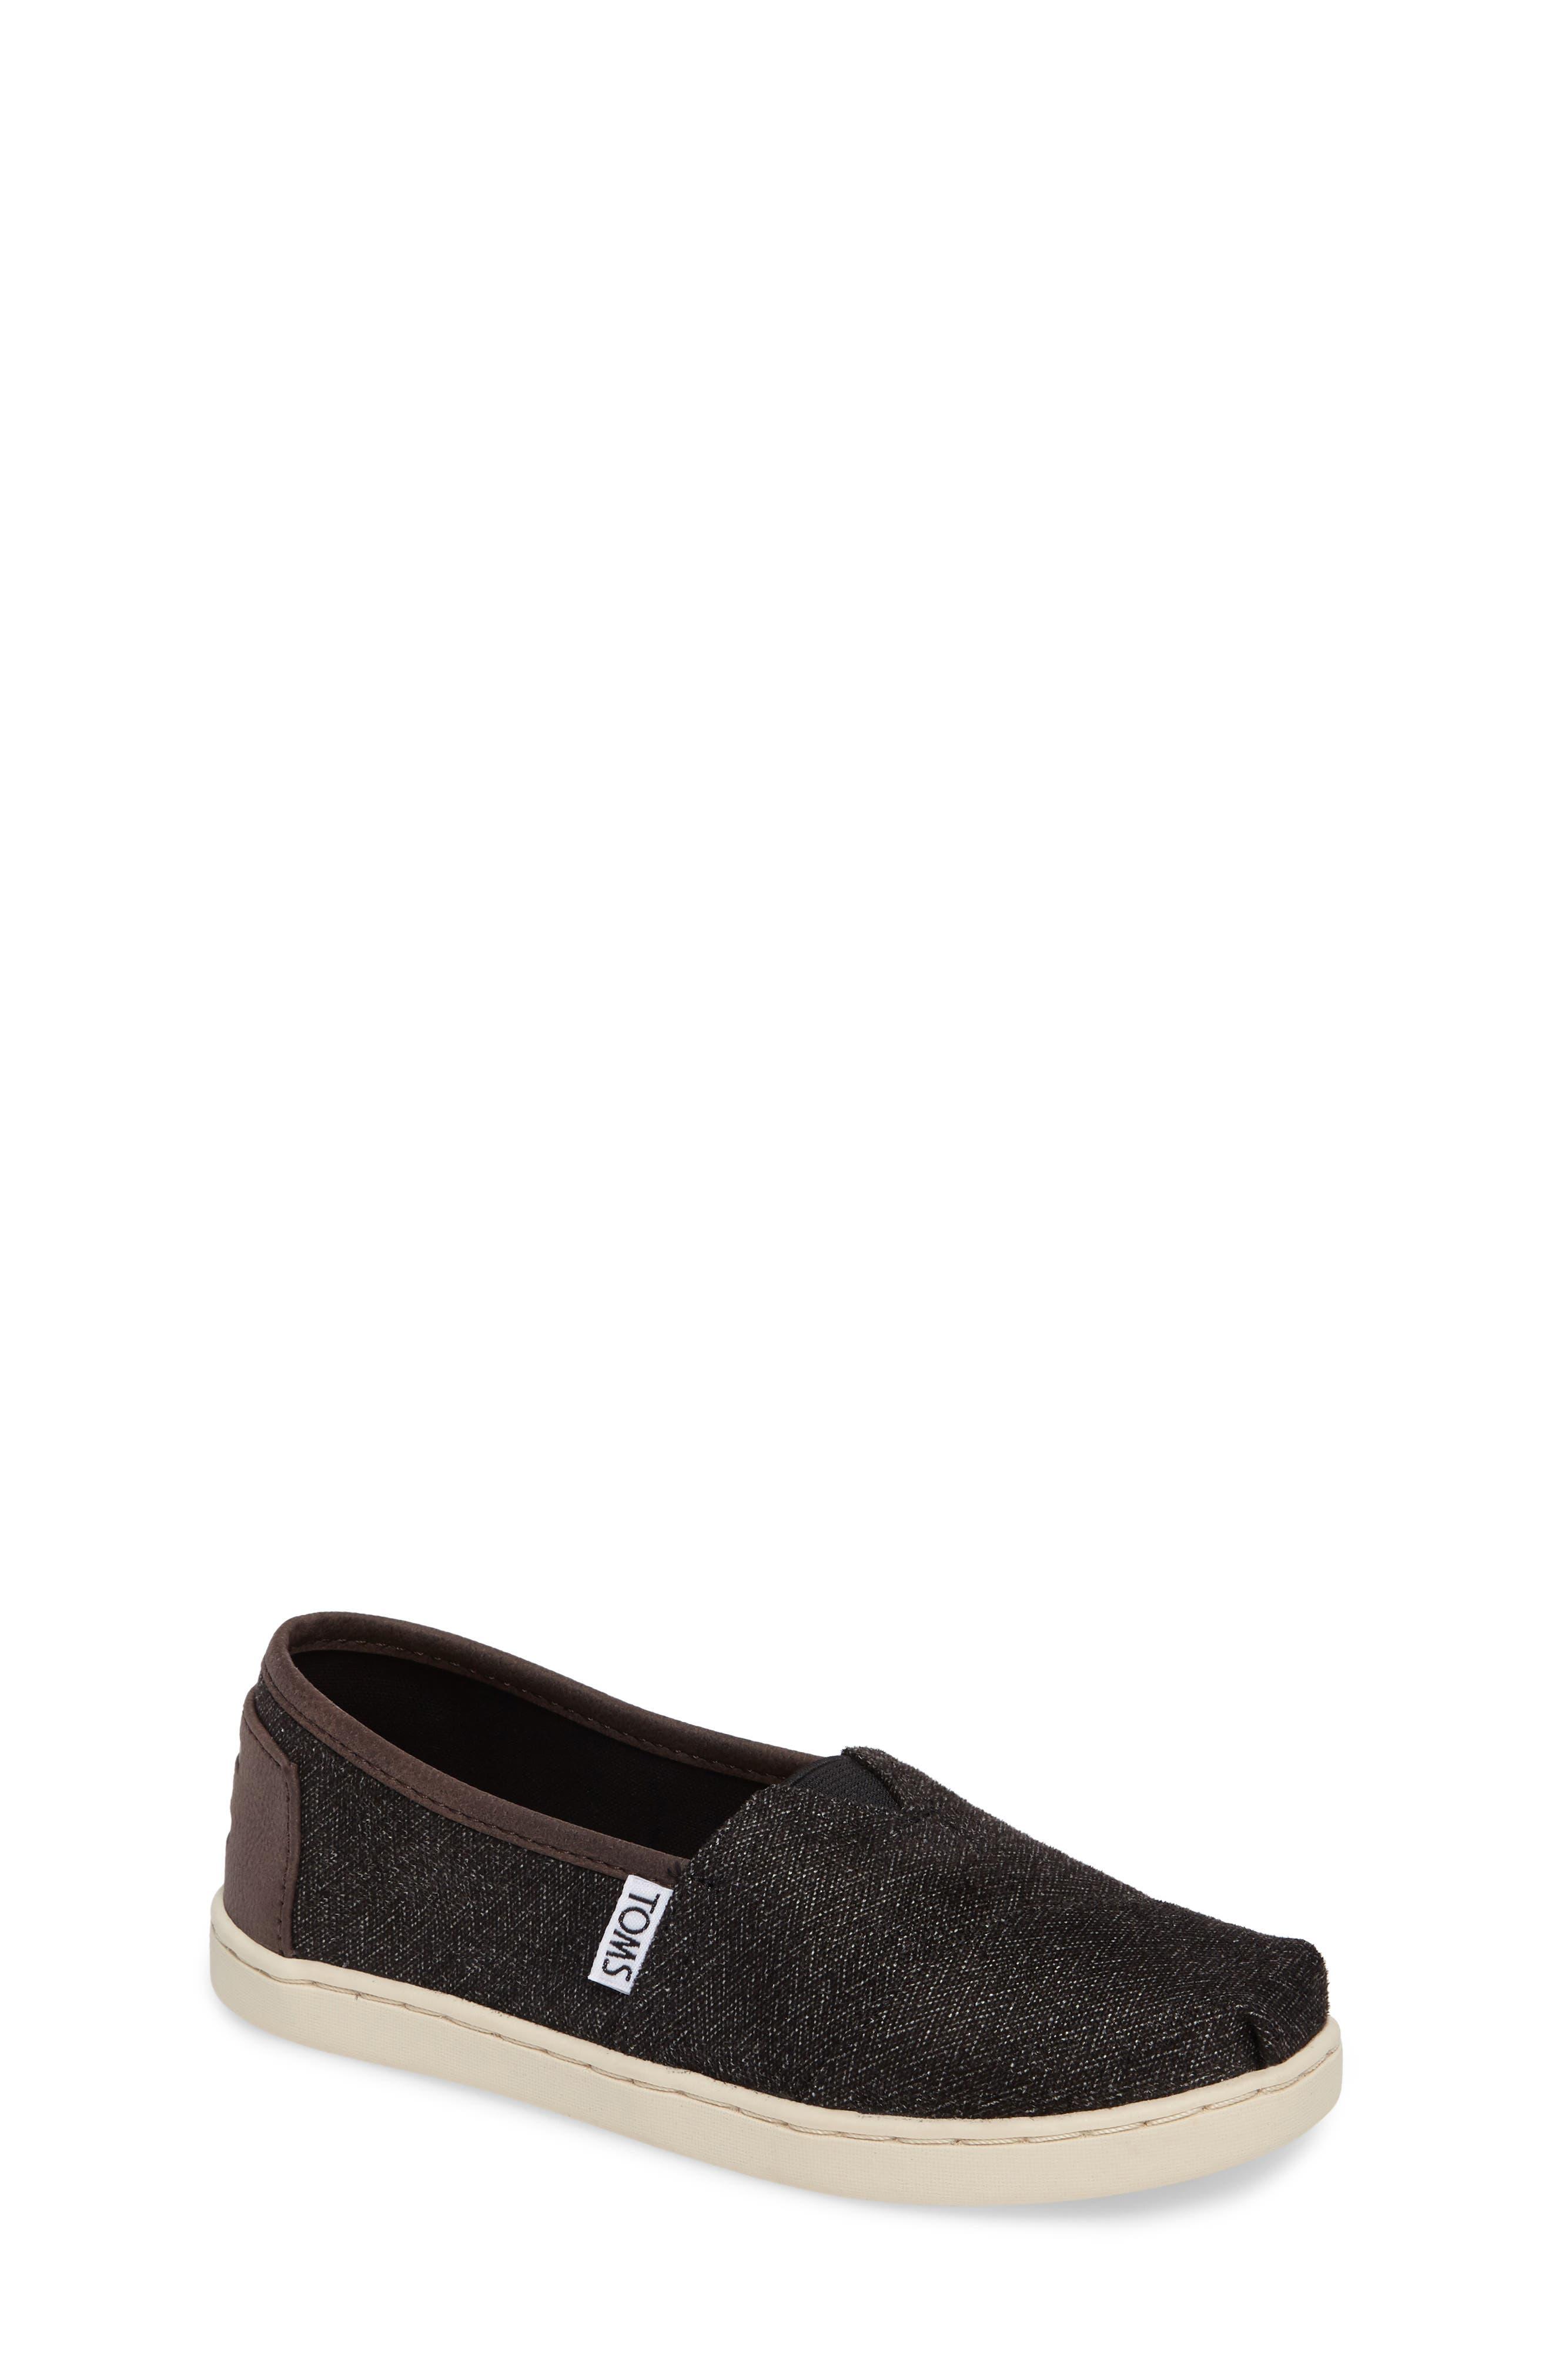 TOMS Herringbone Slip-On Sneaker (Toddler, Little Kid & Big Kid)